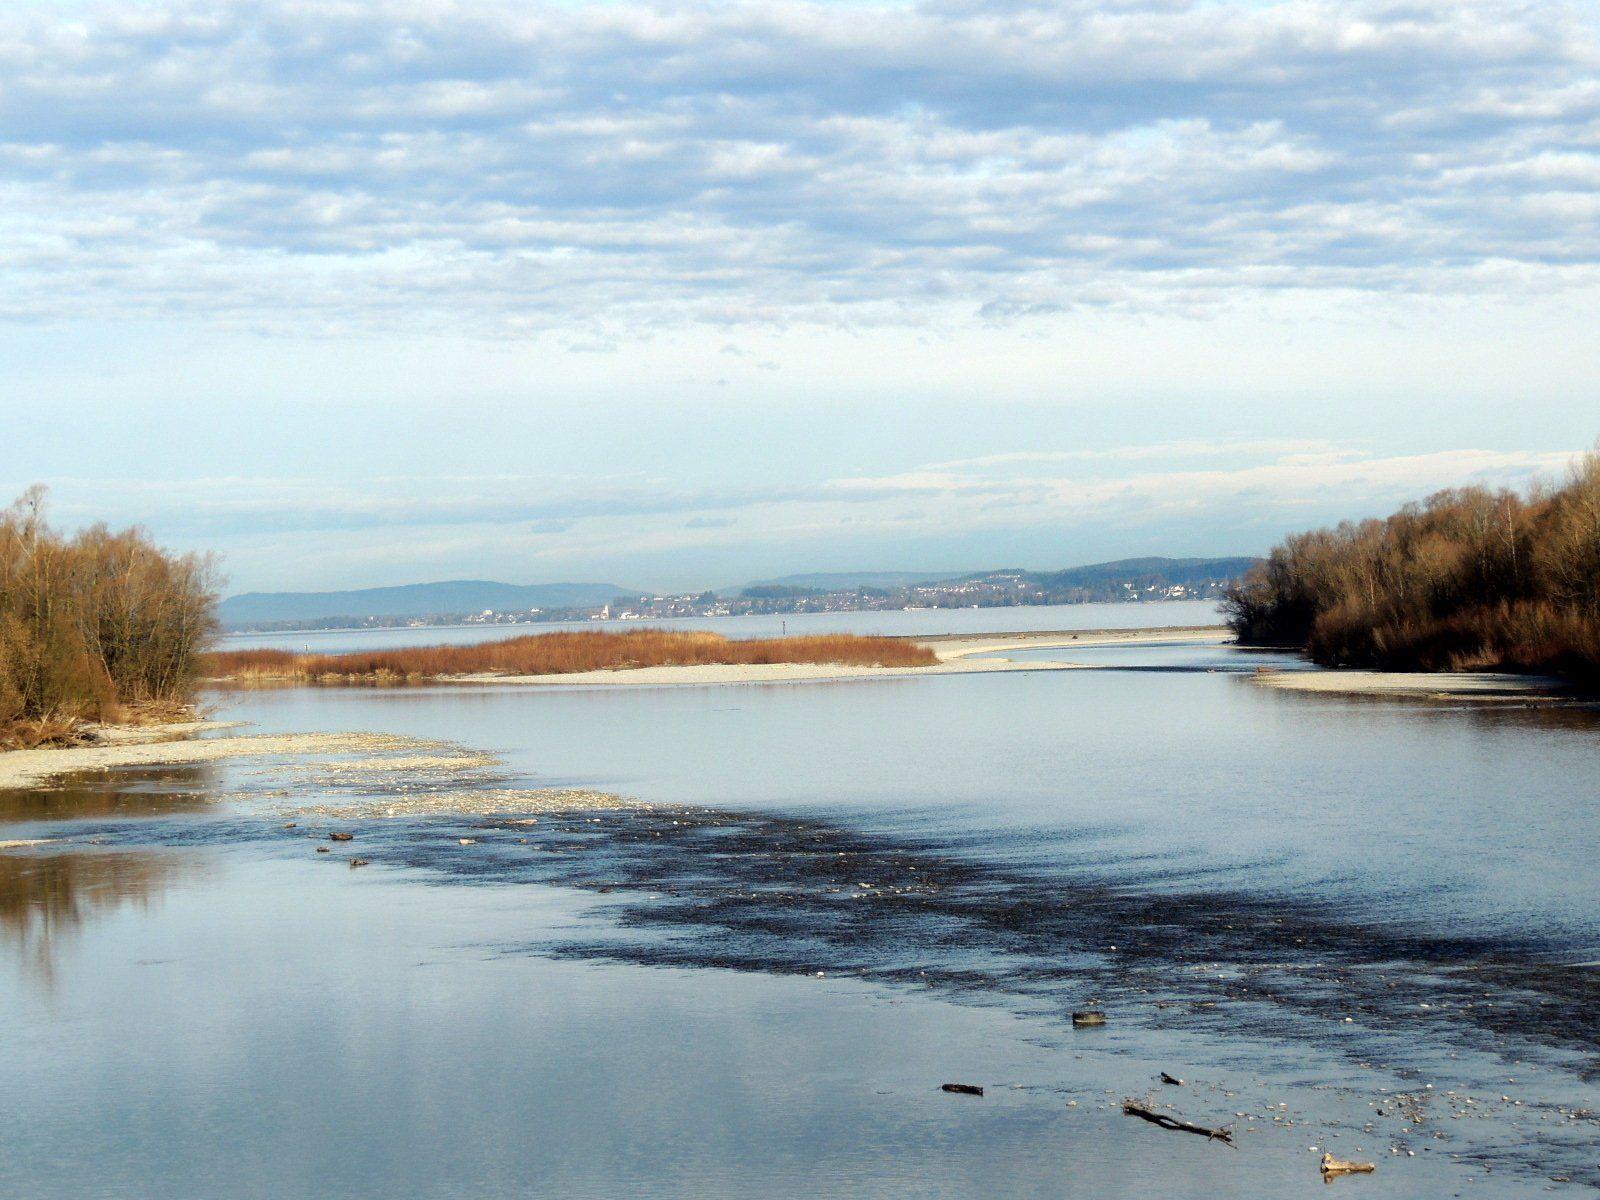 Baumaßnahmen im Mündungsgebiet